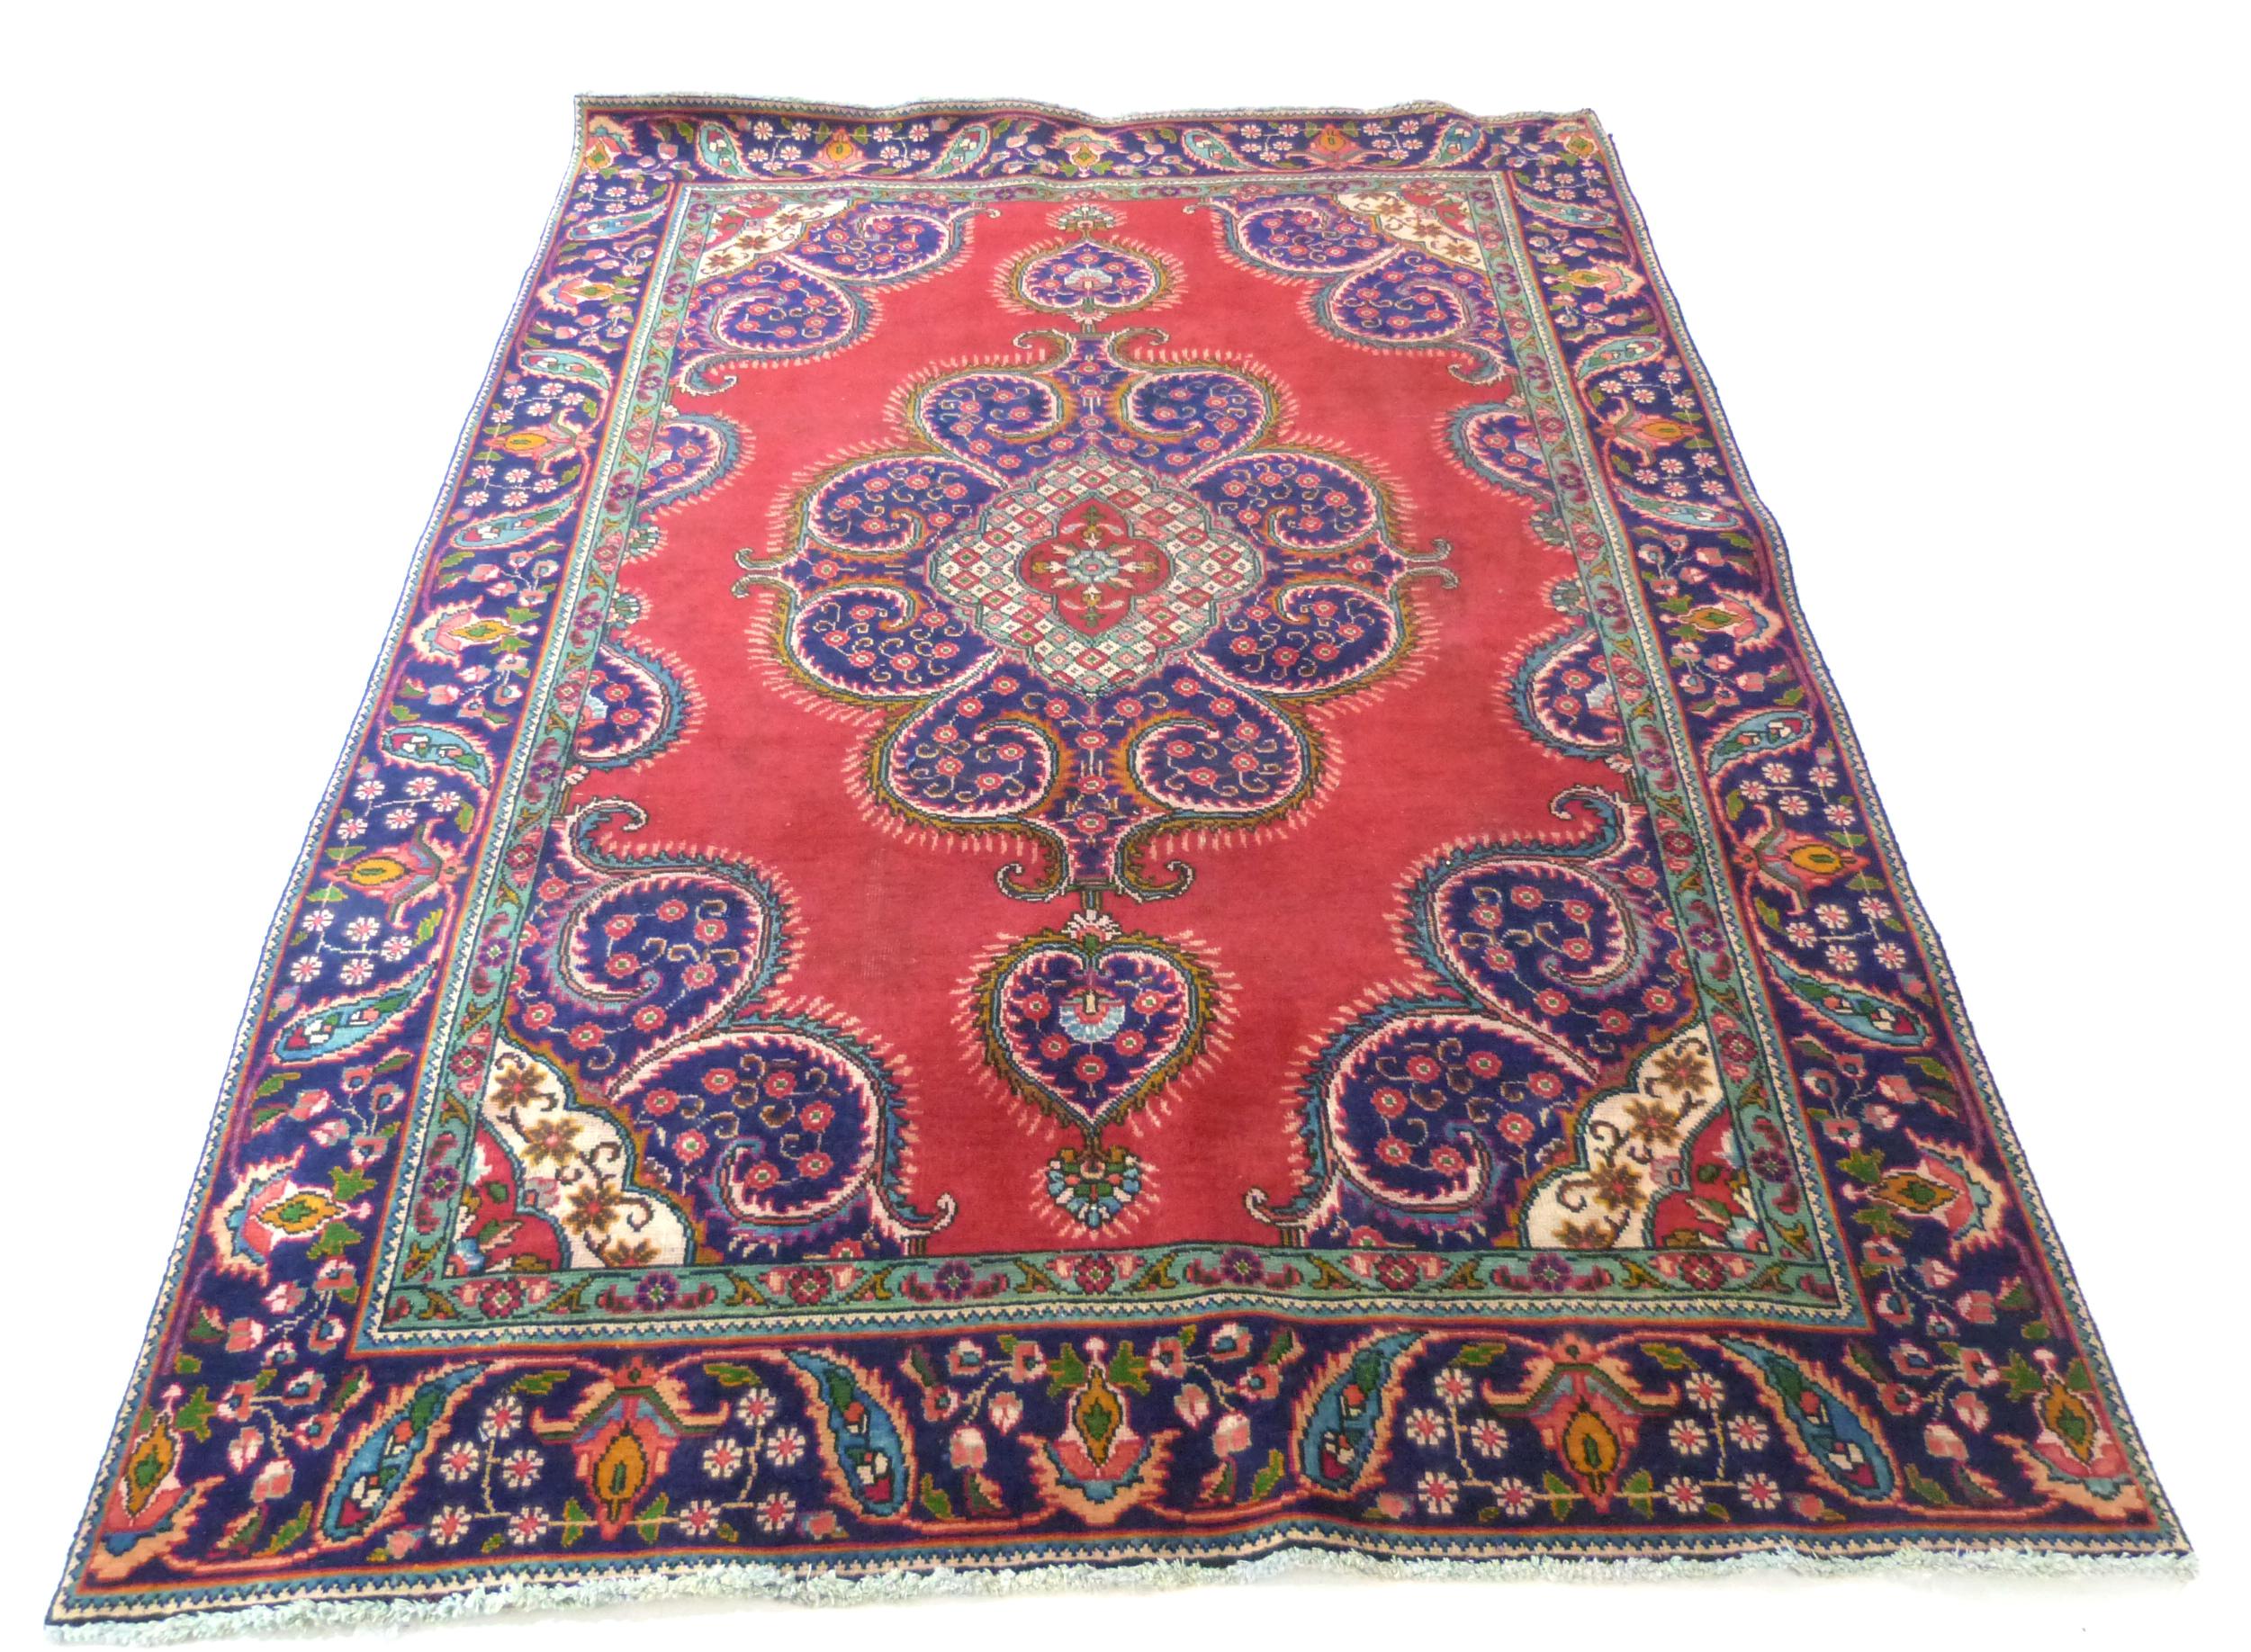 Deep ground thick pile Persian Narouan Carpet,decorated with various motifs & symbols 276cm x